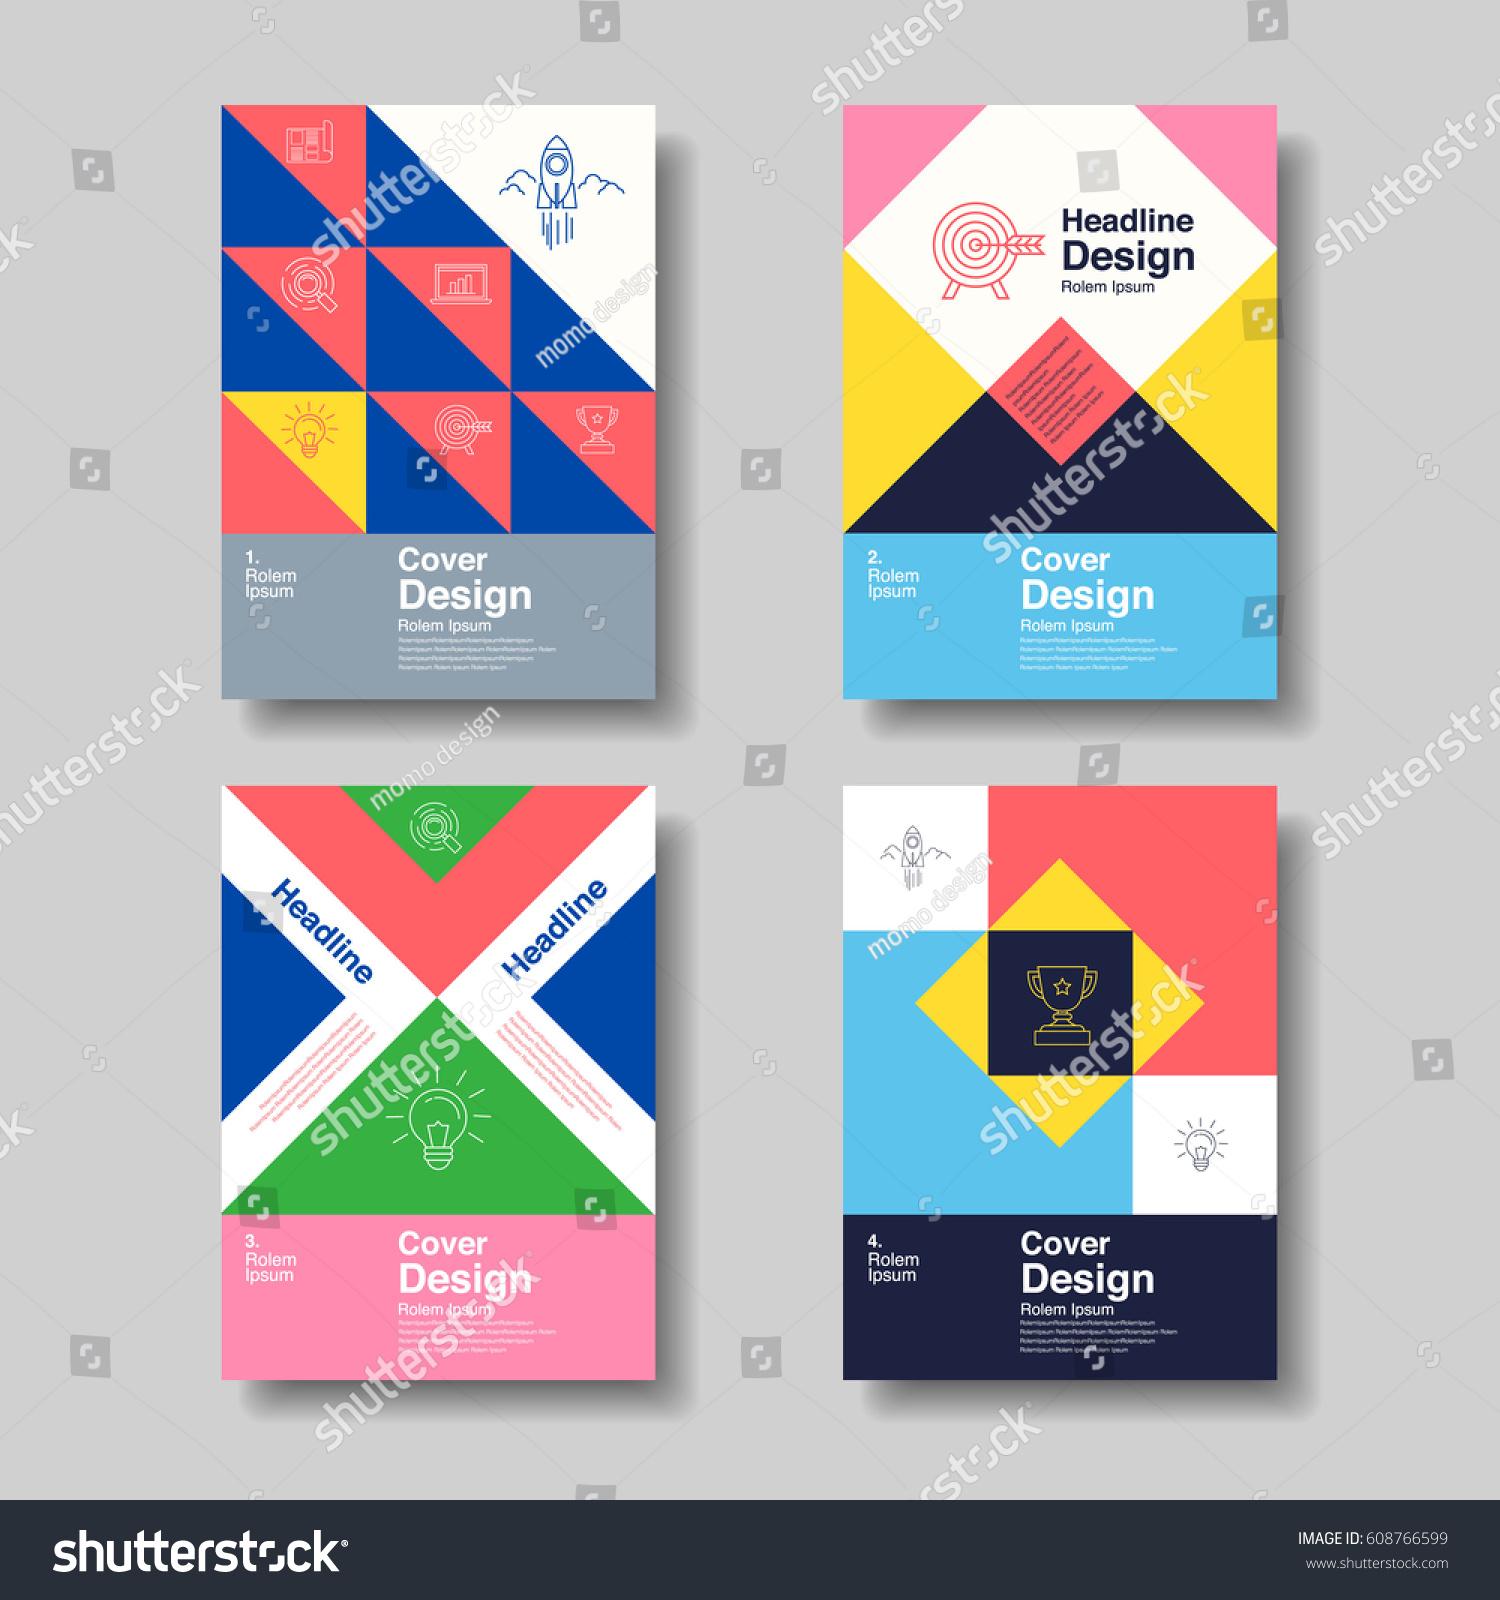 Layout Design Template Cover Book Flyer Stock-Vektorgrafik 608766599 ...